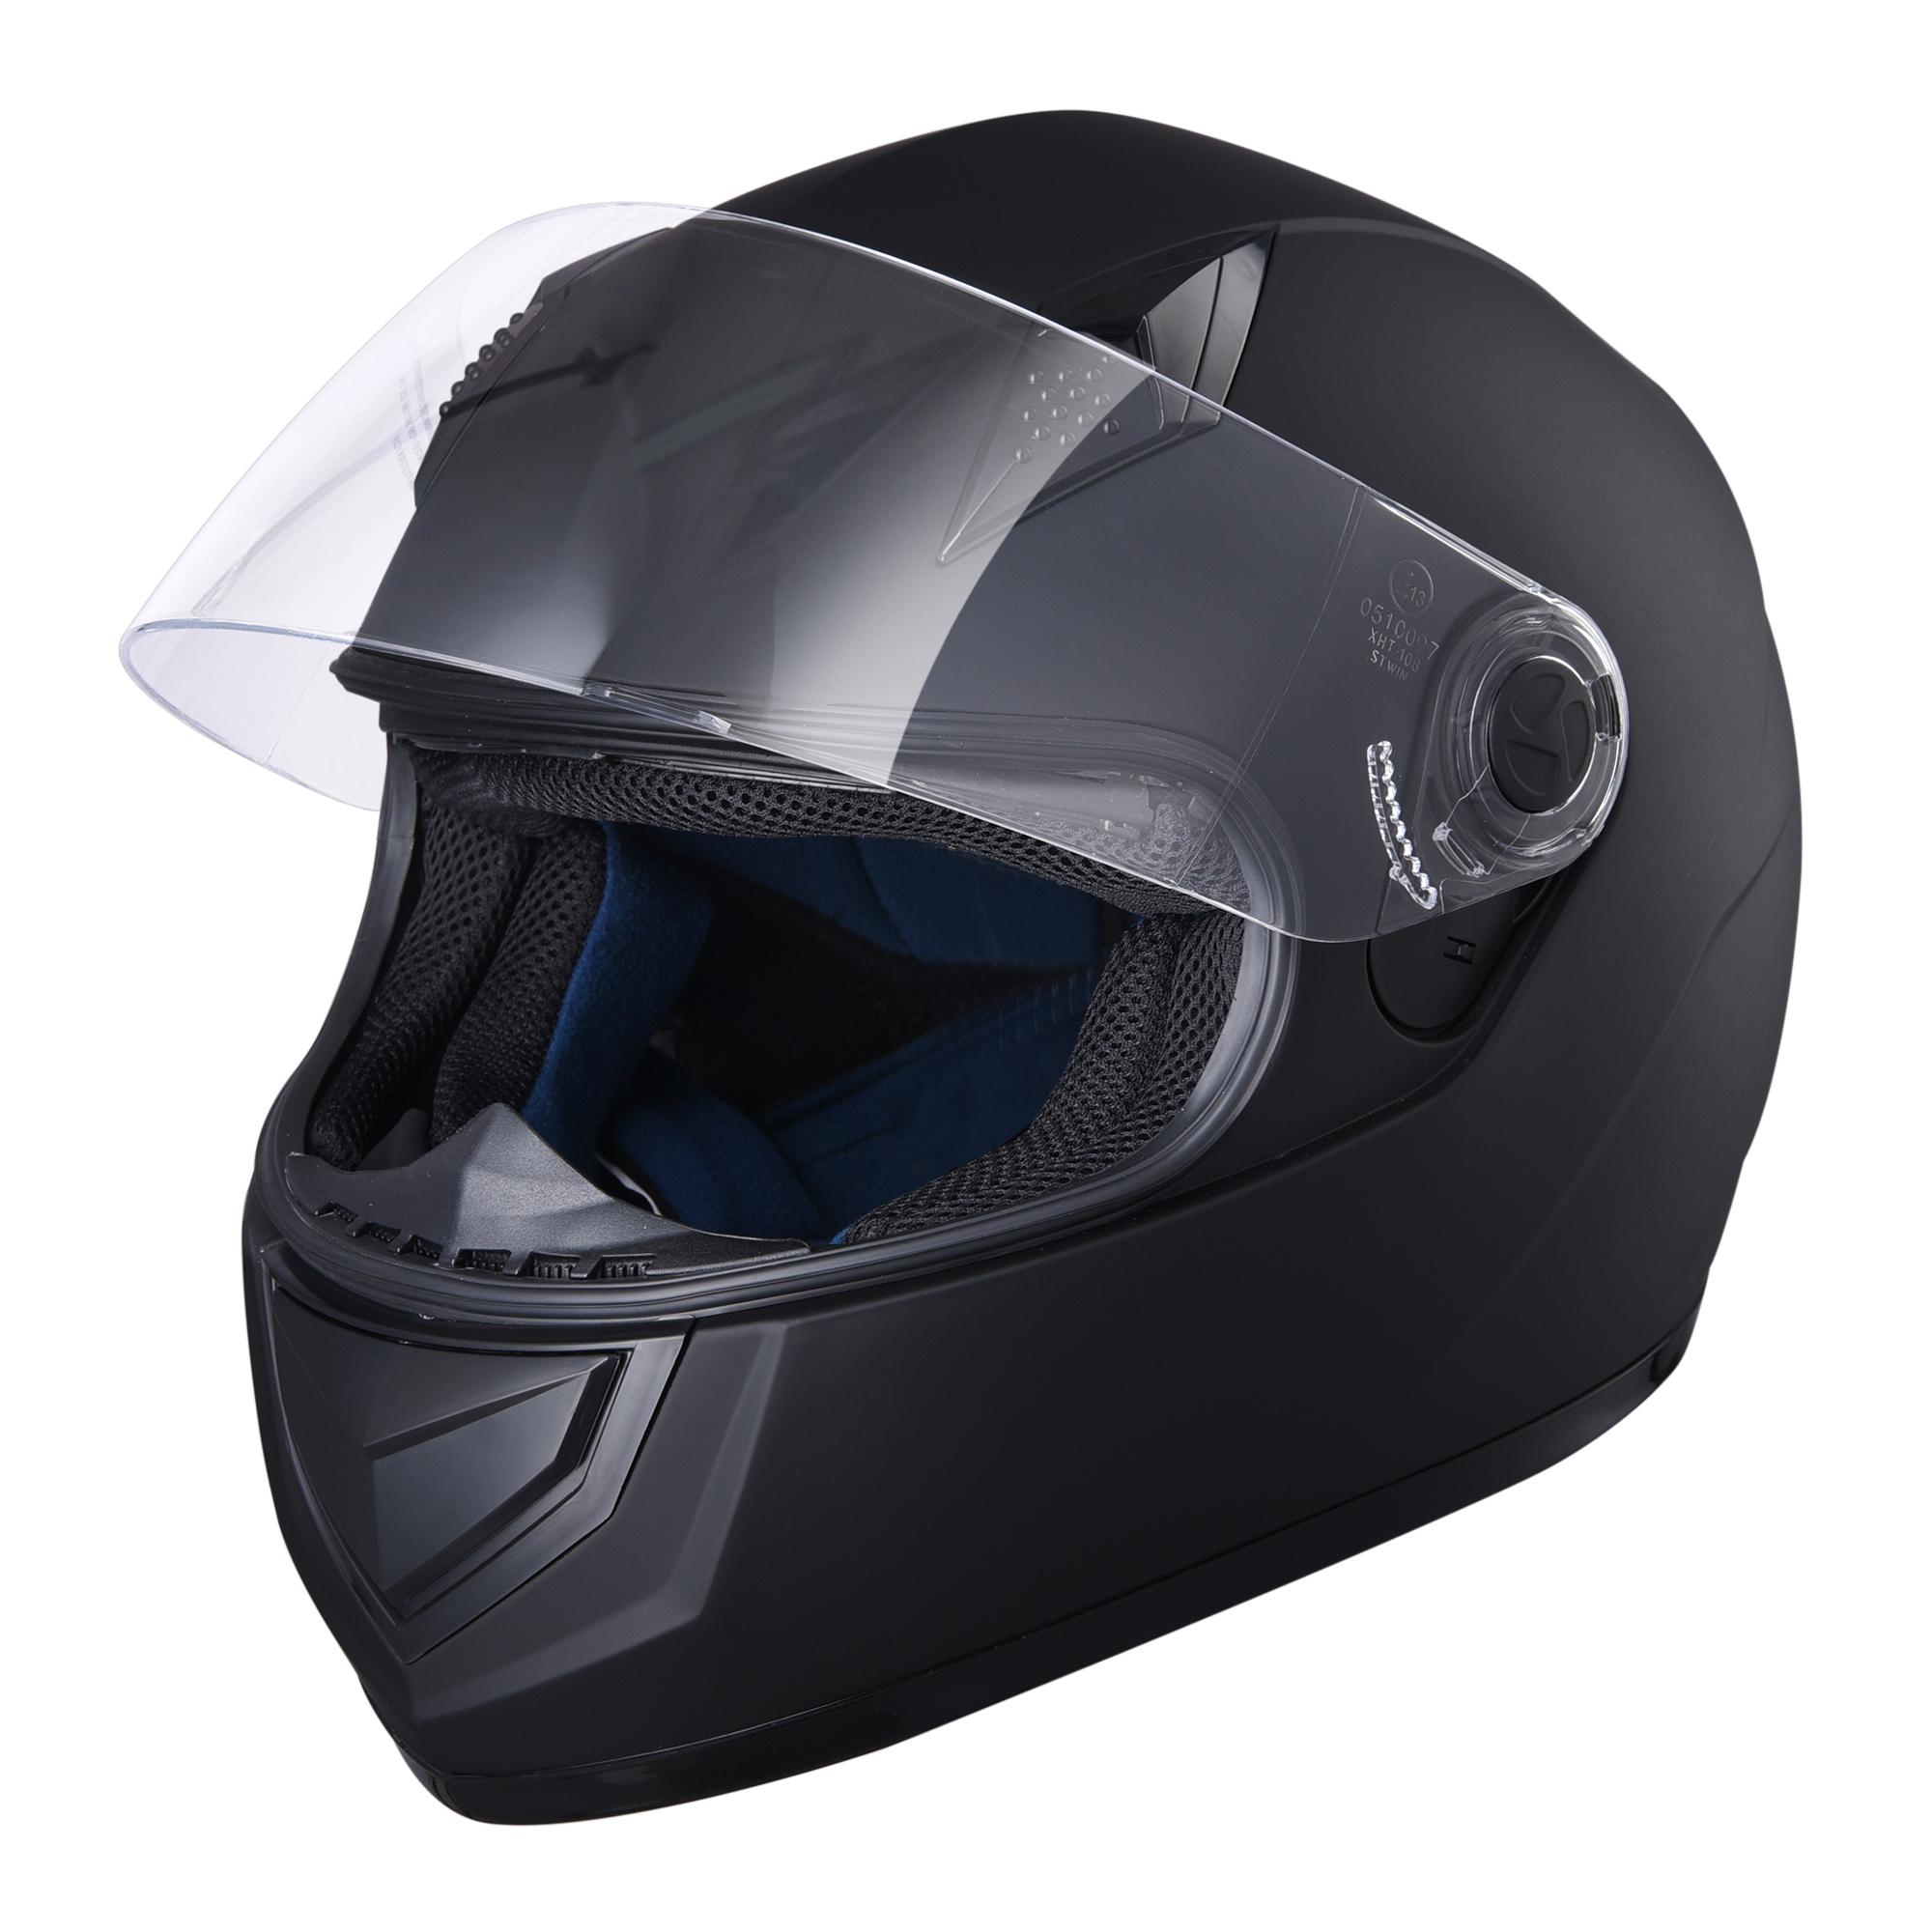 miniature 62 - AHR K12 Full Face Motorcycle Helmet DOT Air Vents Clear Visor Racing S M L XL